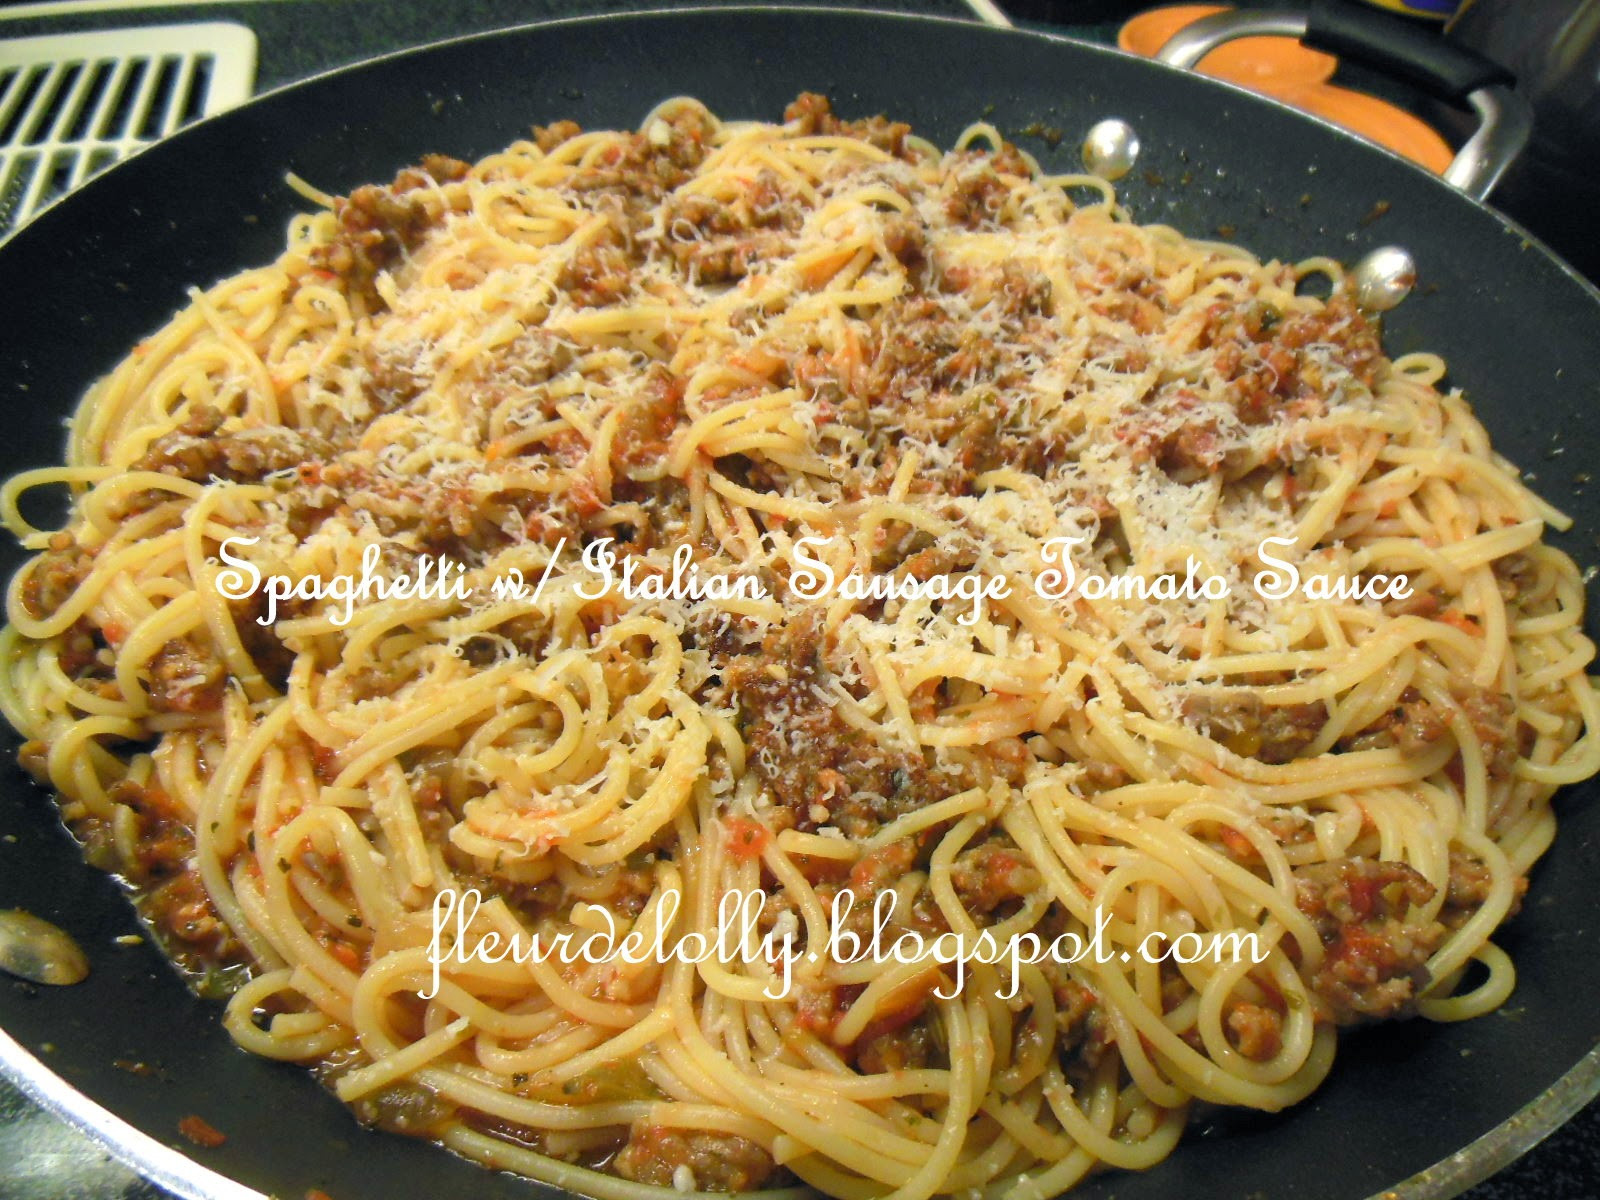 Spaghetti With Italian Sausage  Fleur de Lolly Spaghetti with Italian Sausage and Home